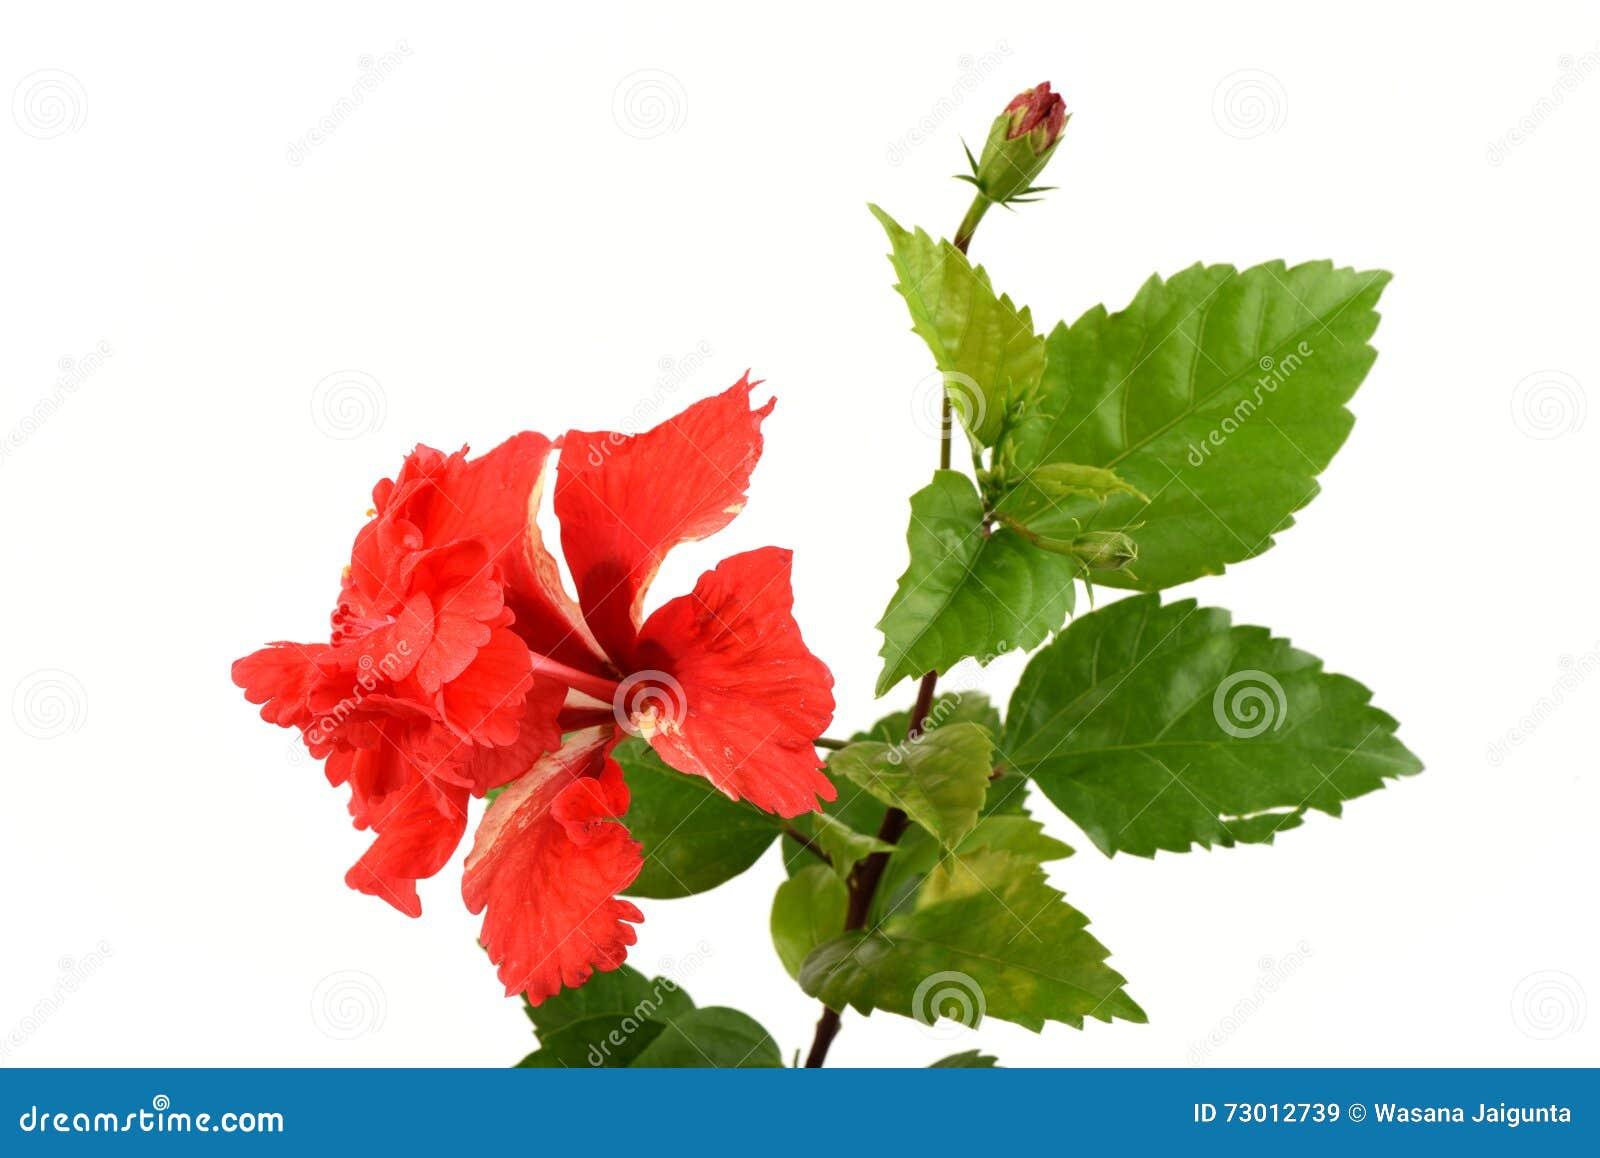 Shoe Flower Hibiscus Chinese Rose On White Background Stock Image